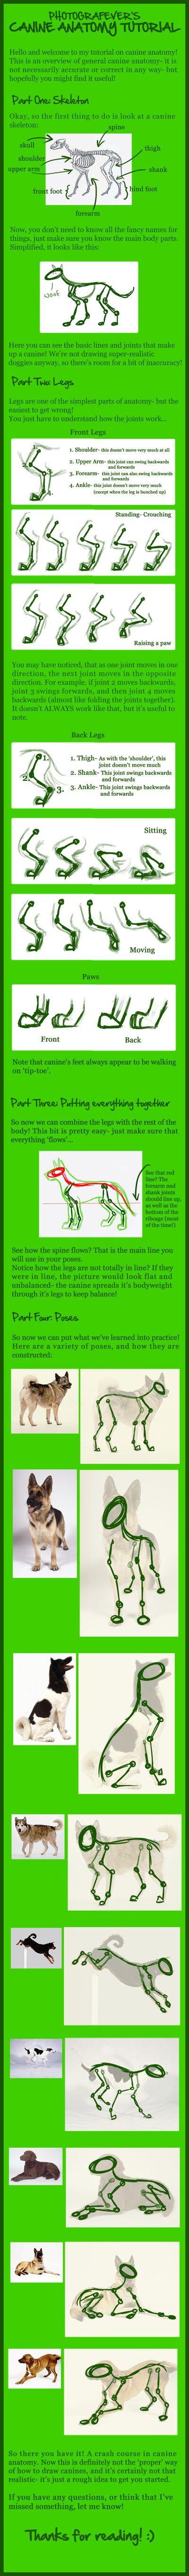 25 Best Canine Anatomy Images Animal Anatomy Dog Anatomy Drawings